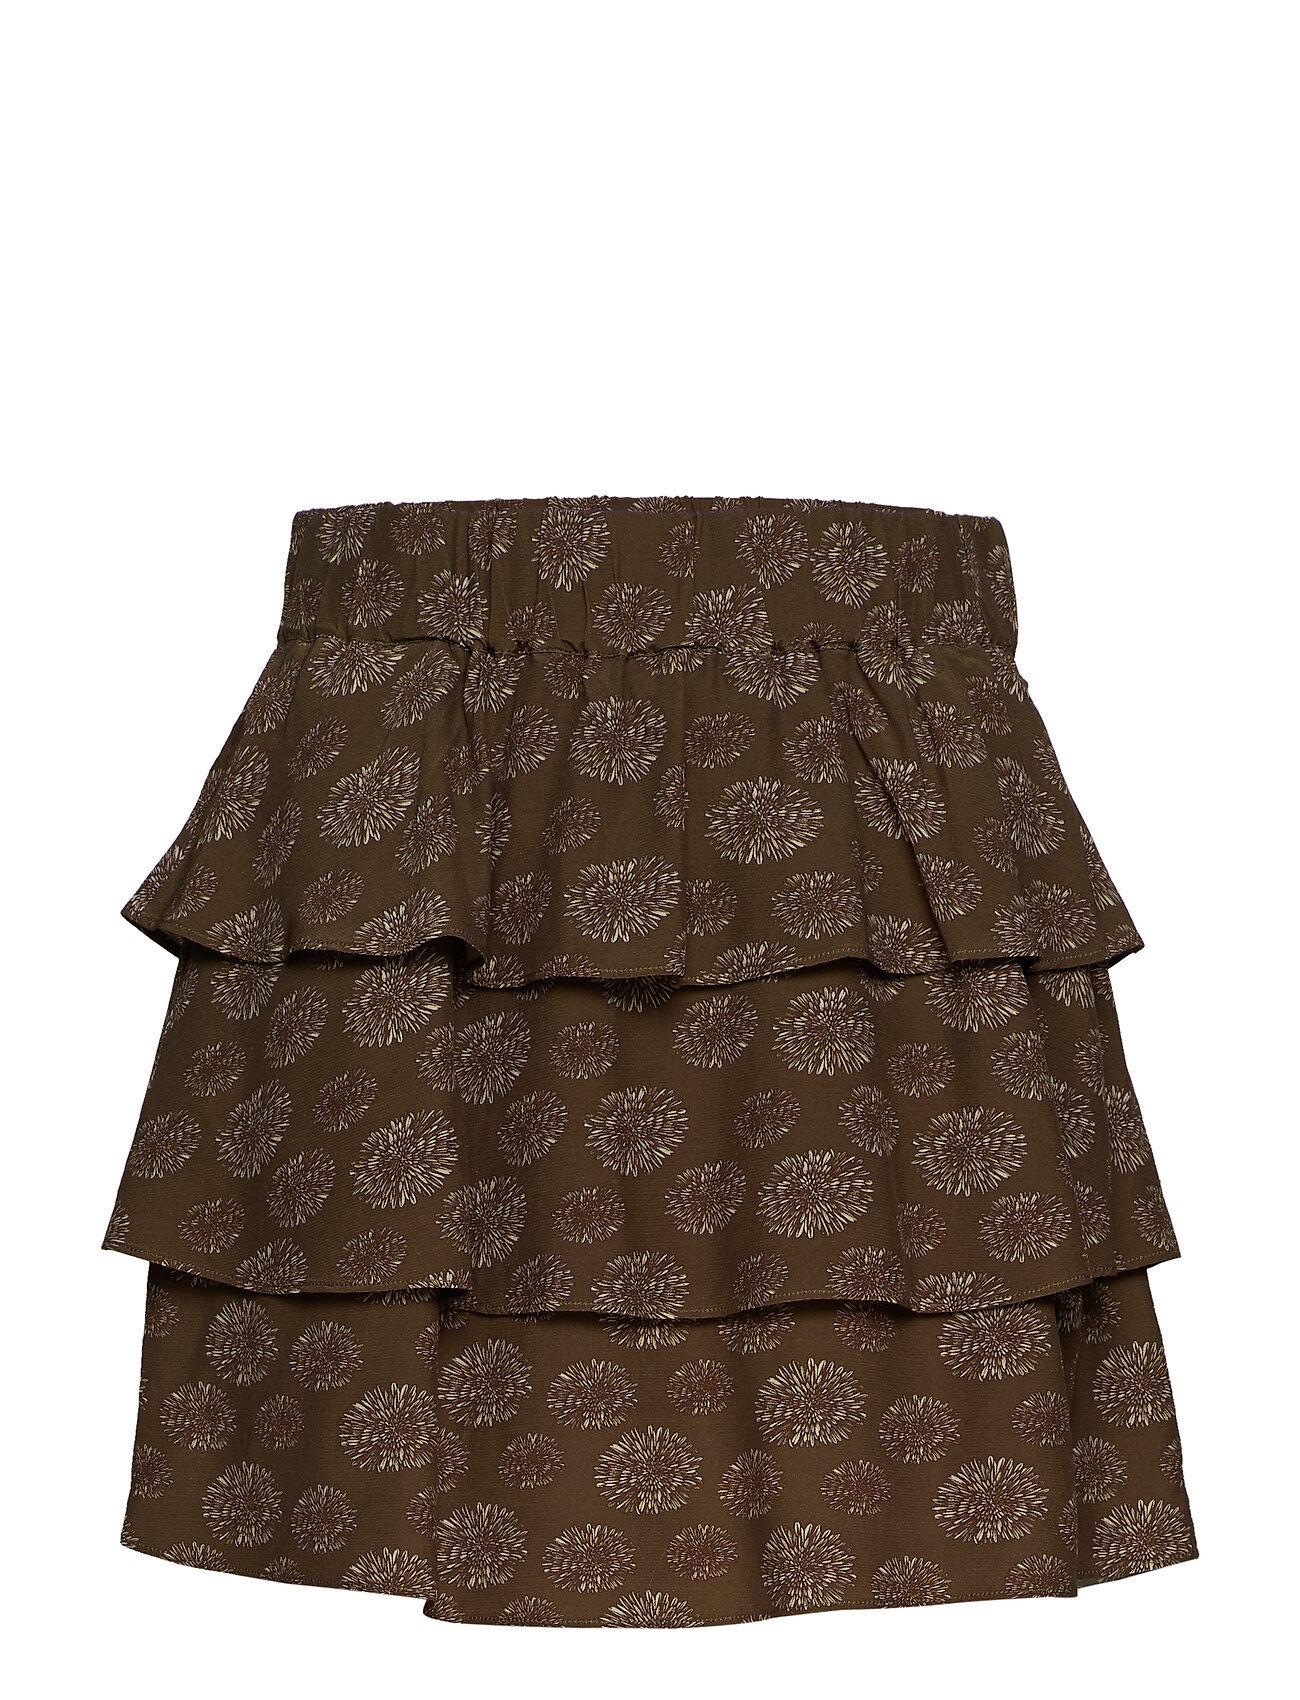 Mayla Stockholm Ariana Mini Skirt